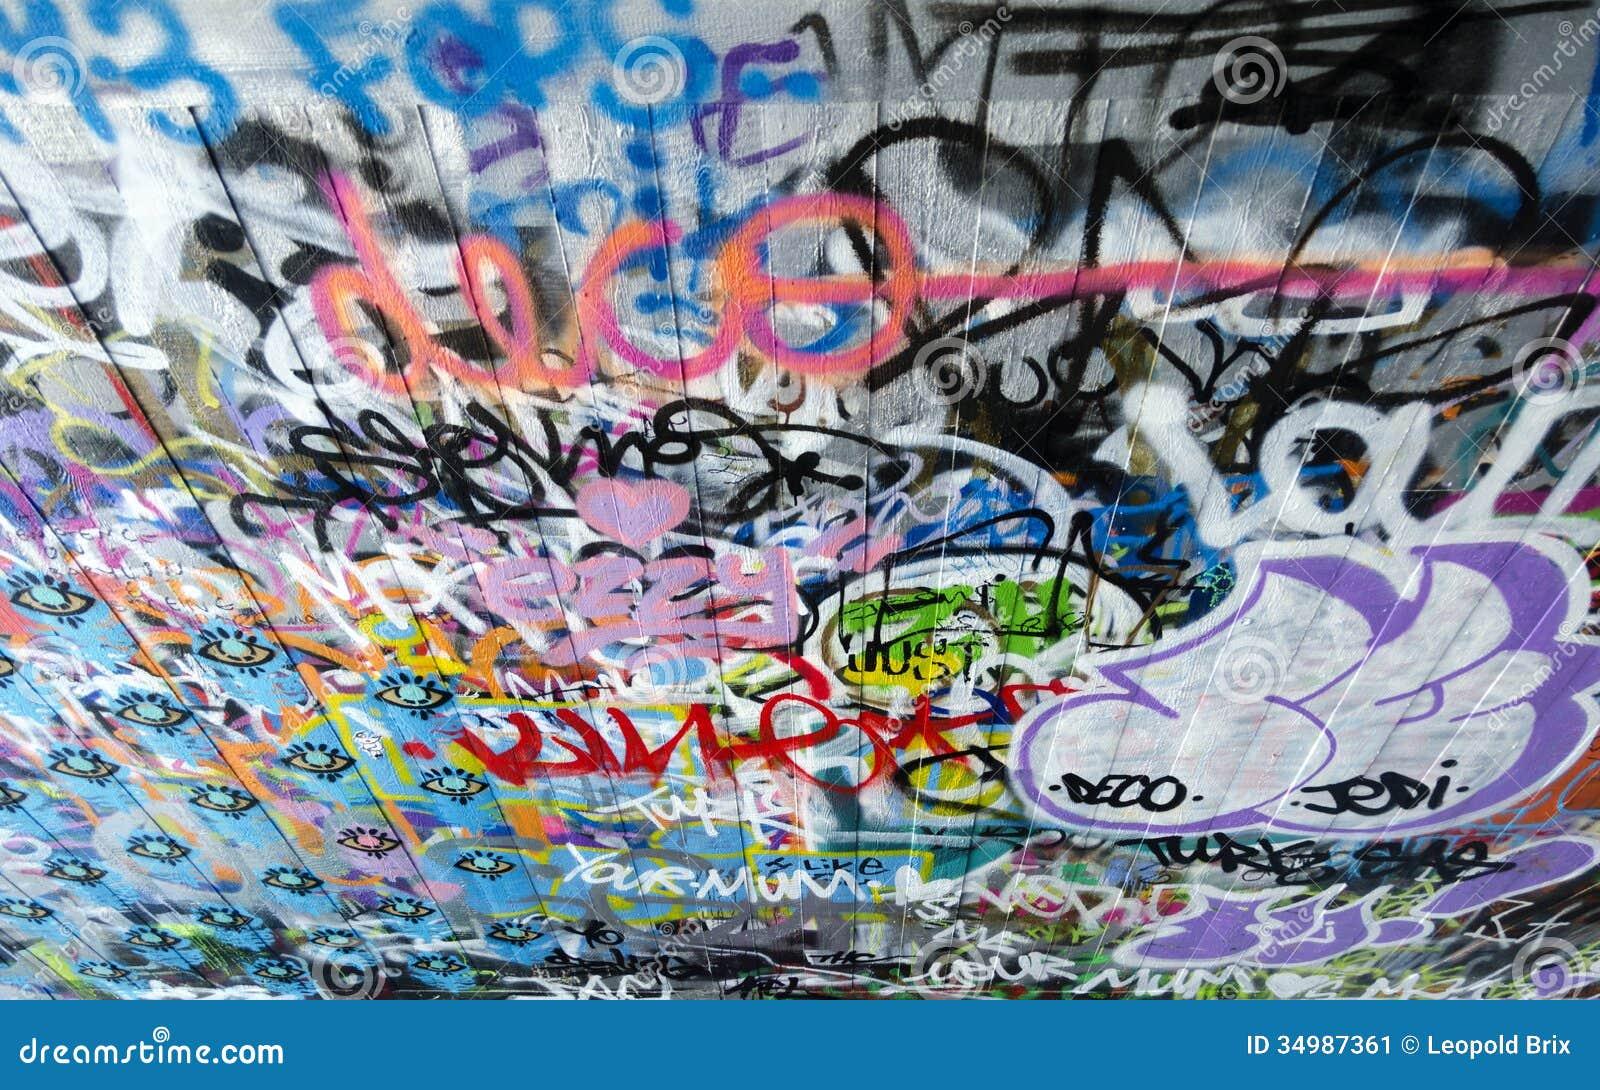 London graffiti on skate park 2 stock image image of south london graffiti on skate park 2 altavistaventures Choice Image